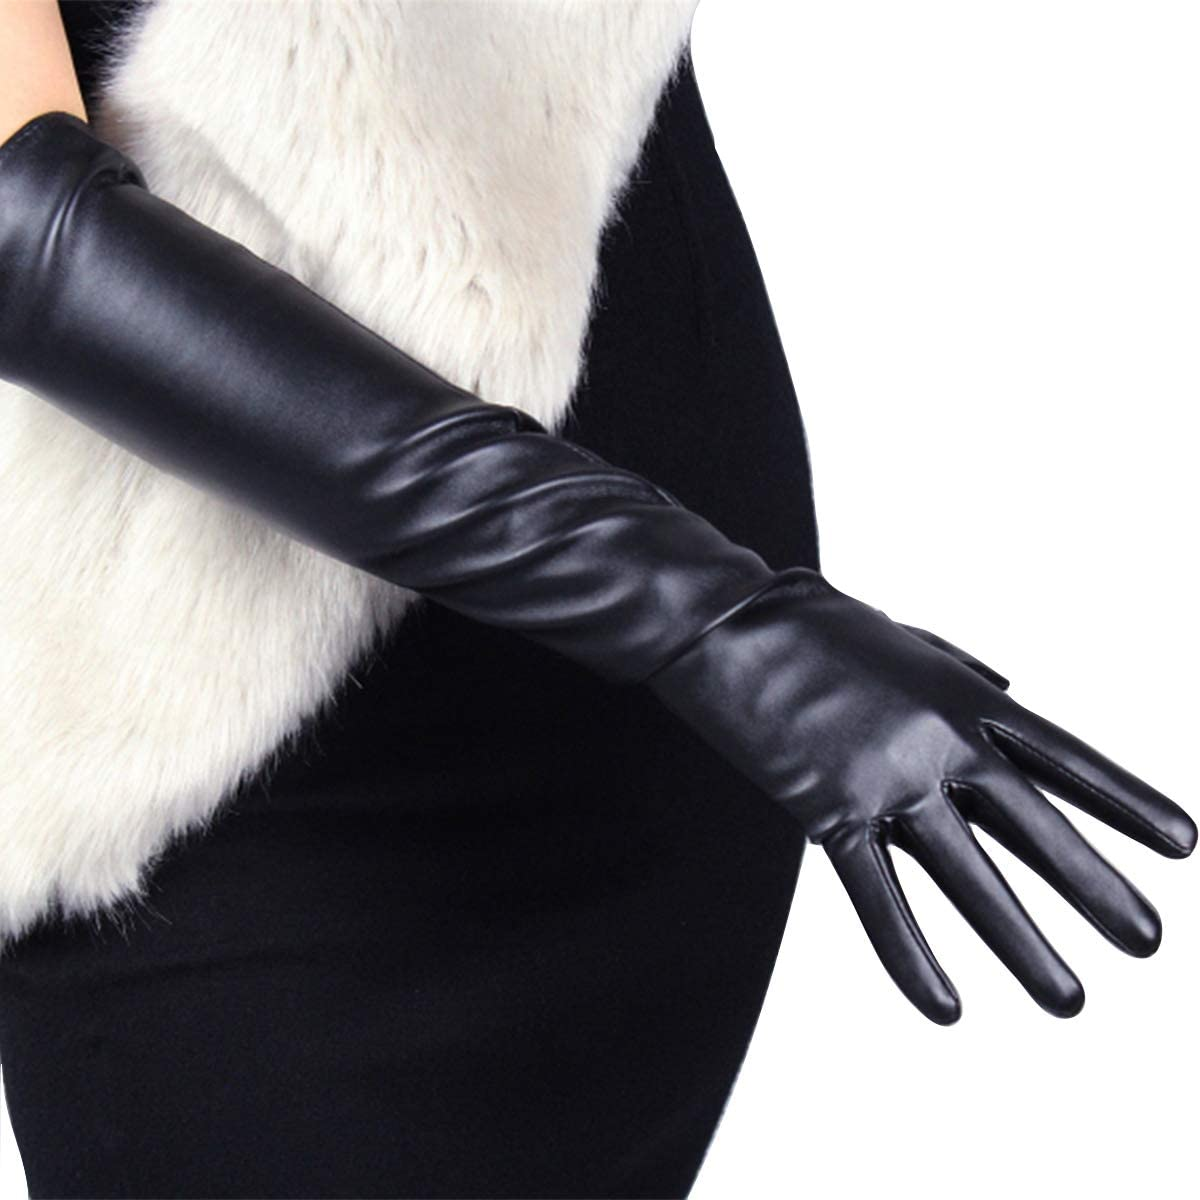 DooWay Opera Gloves 20-inch...